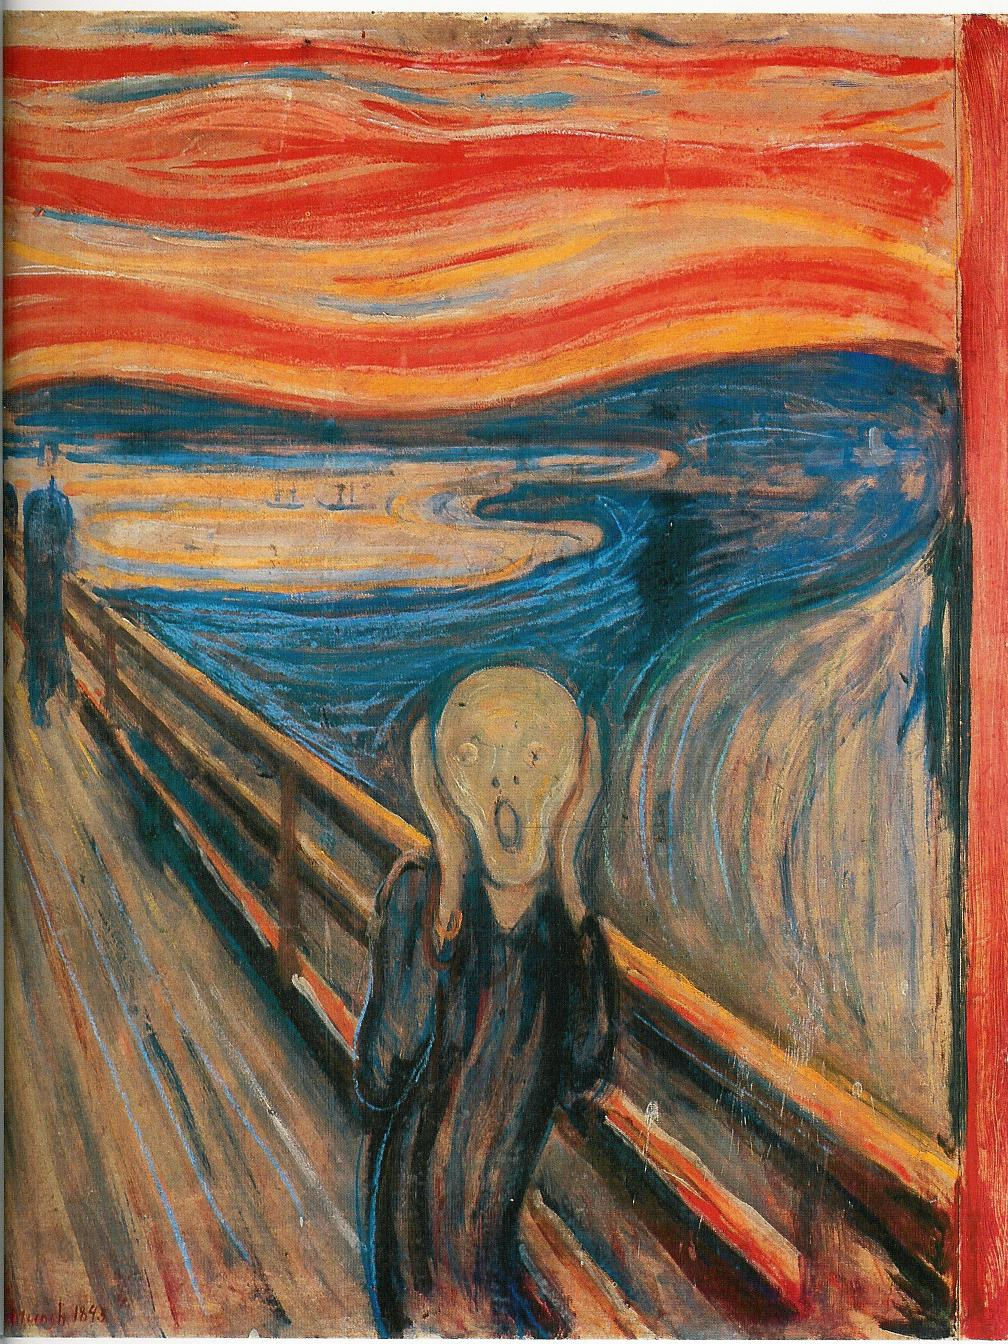 Edvard Munch – The Scream (1893)